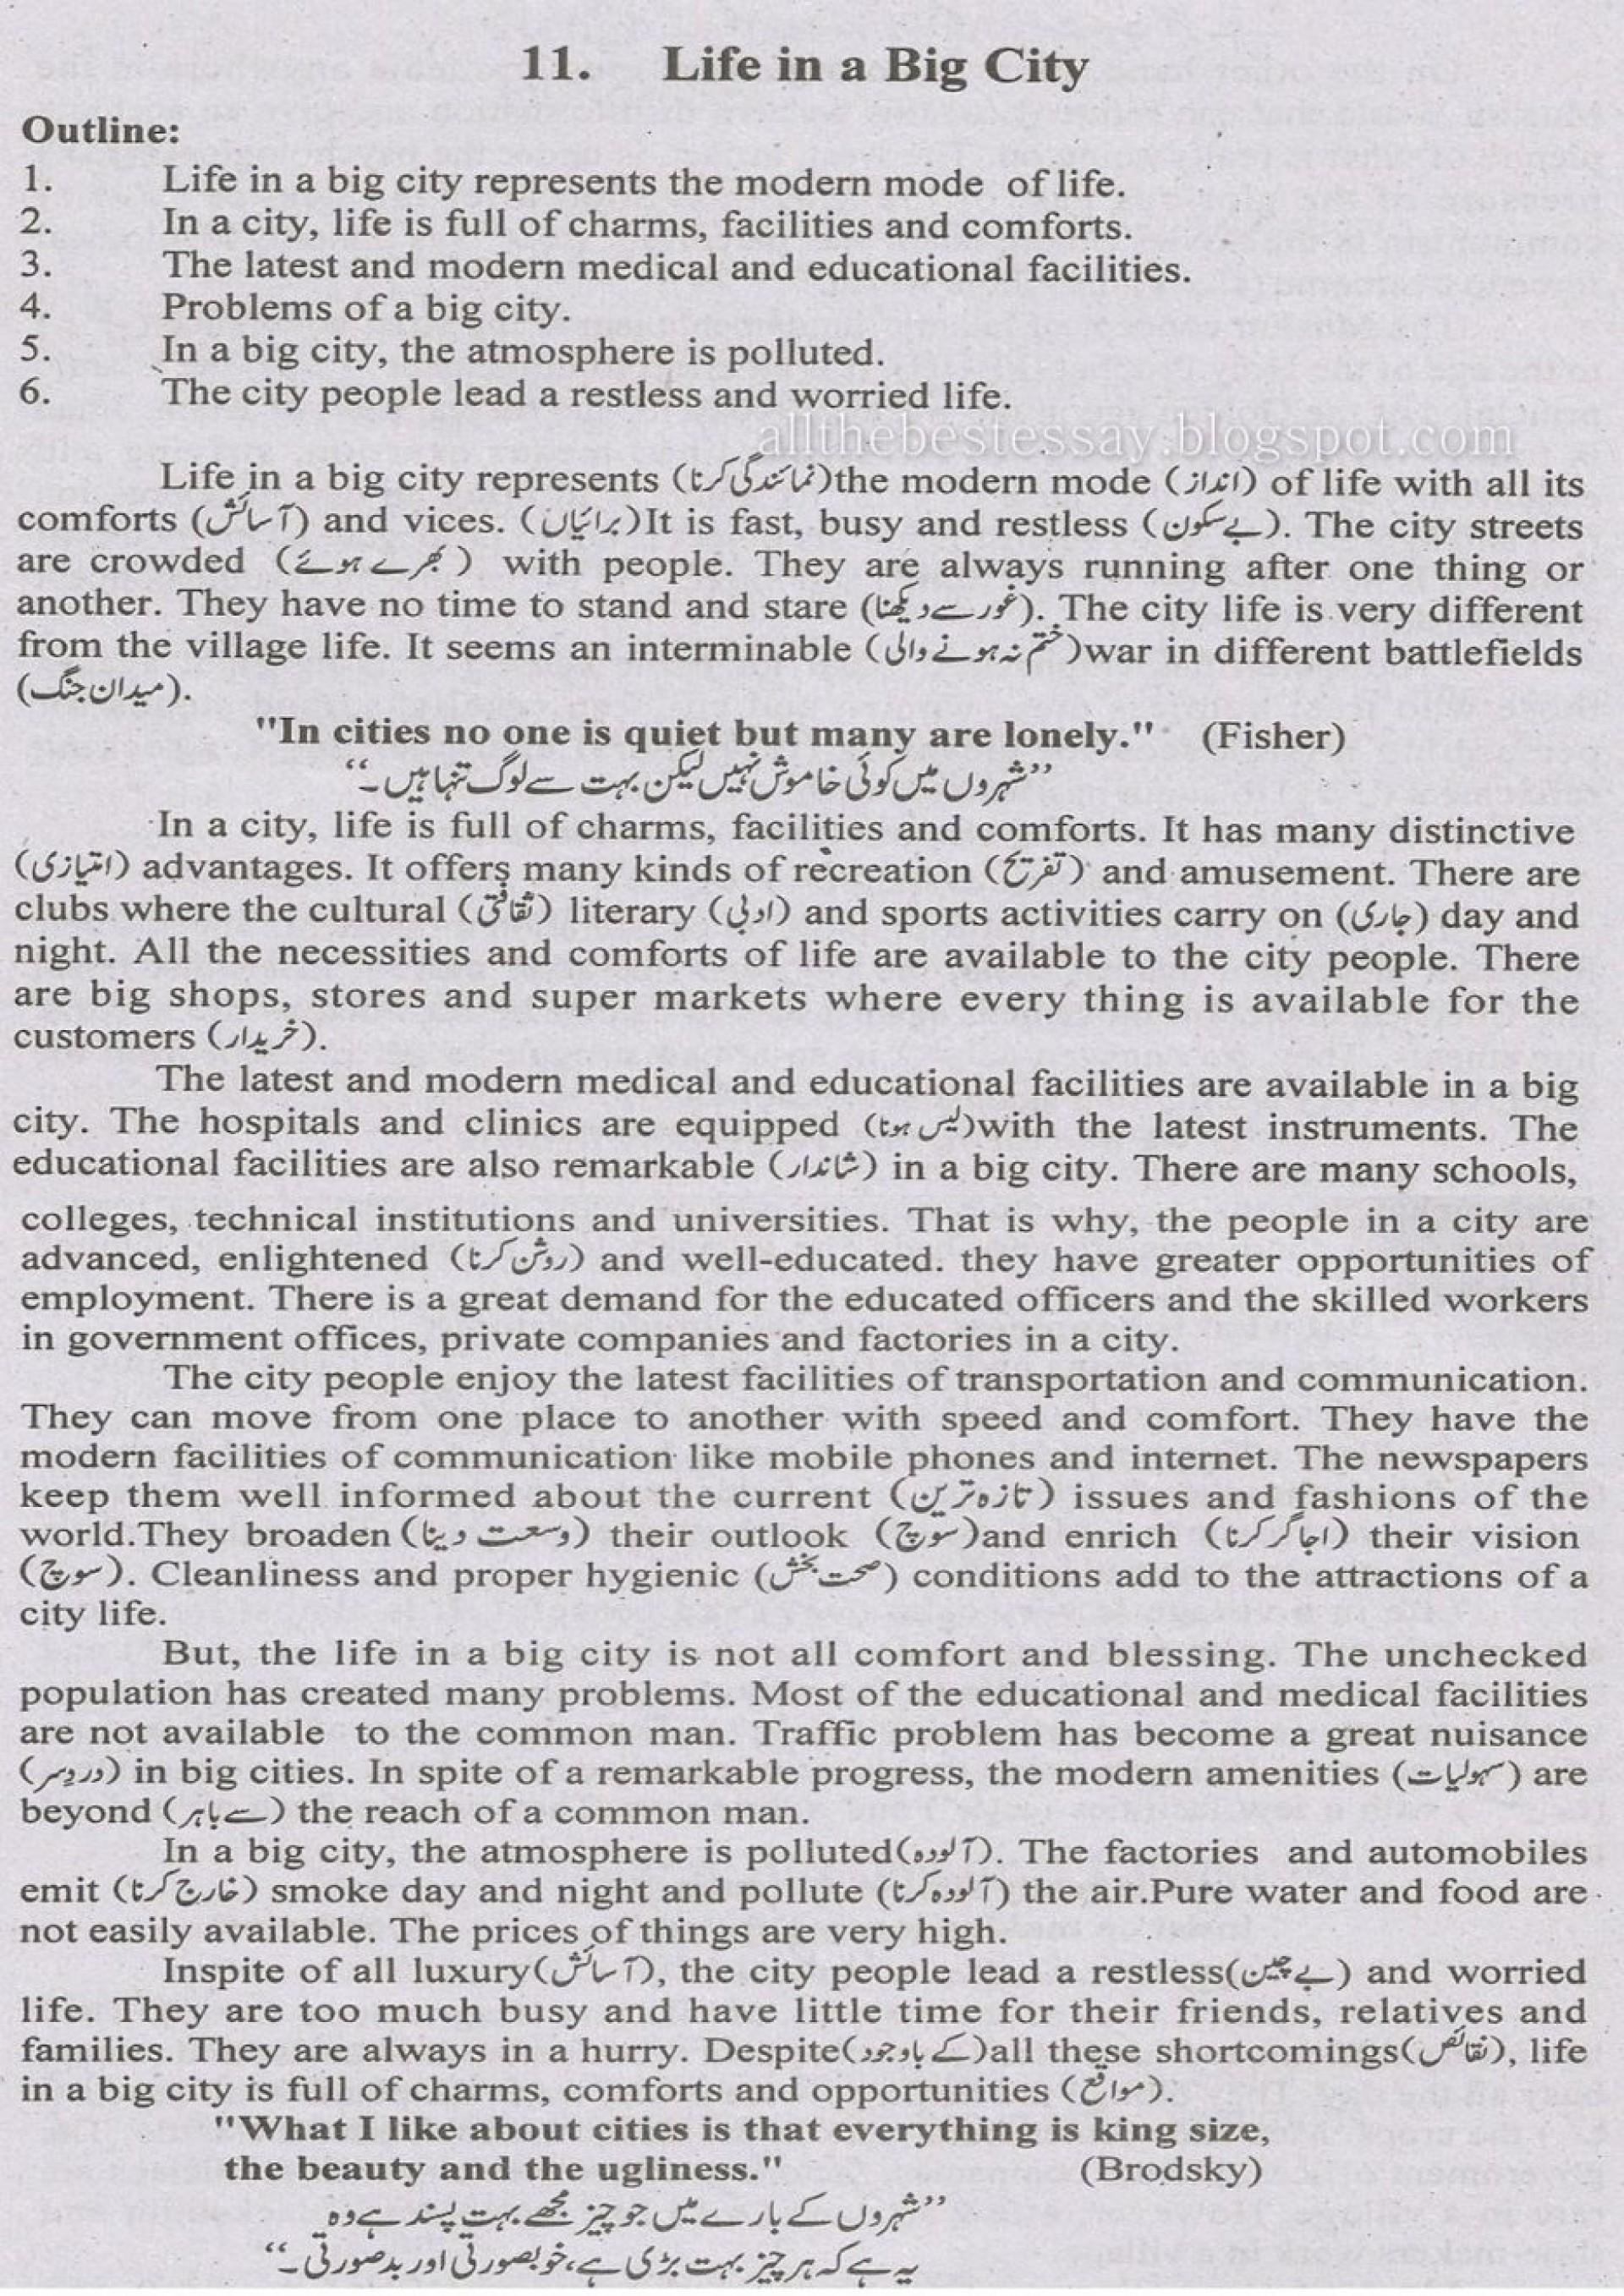 016 Essay City Life Untitled On In Hindi Vs Village Sanskrit Language Problems Gujarati Is Better Thandvantages Urdu Englishnd 936x1324 Example Impressive A Indian English 1920